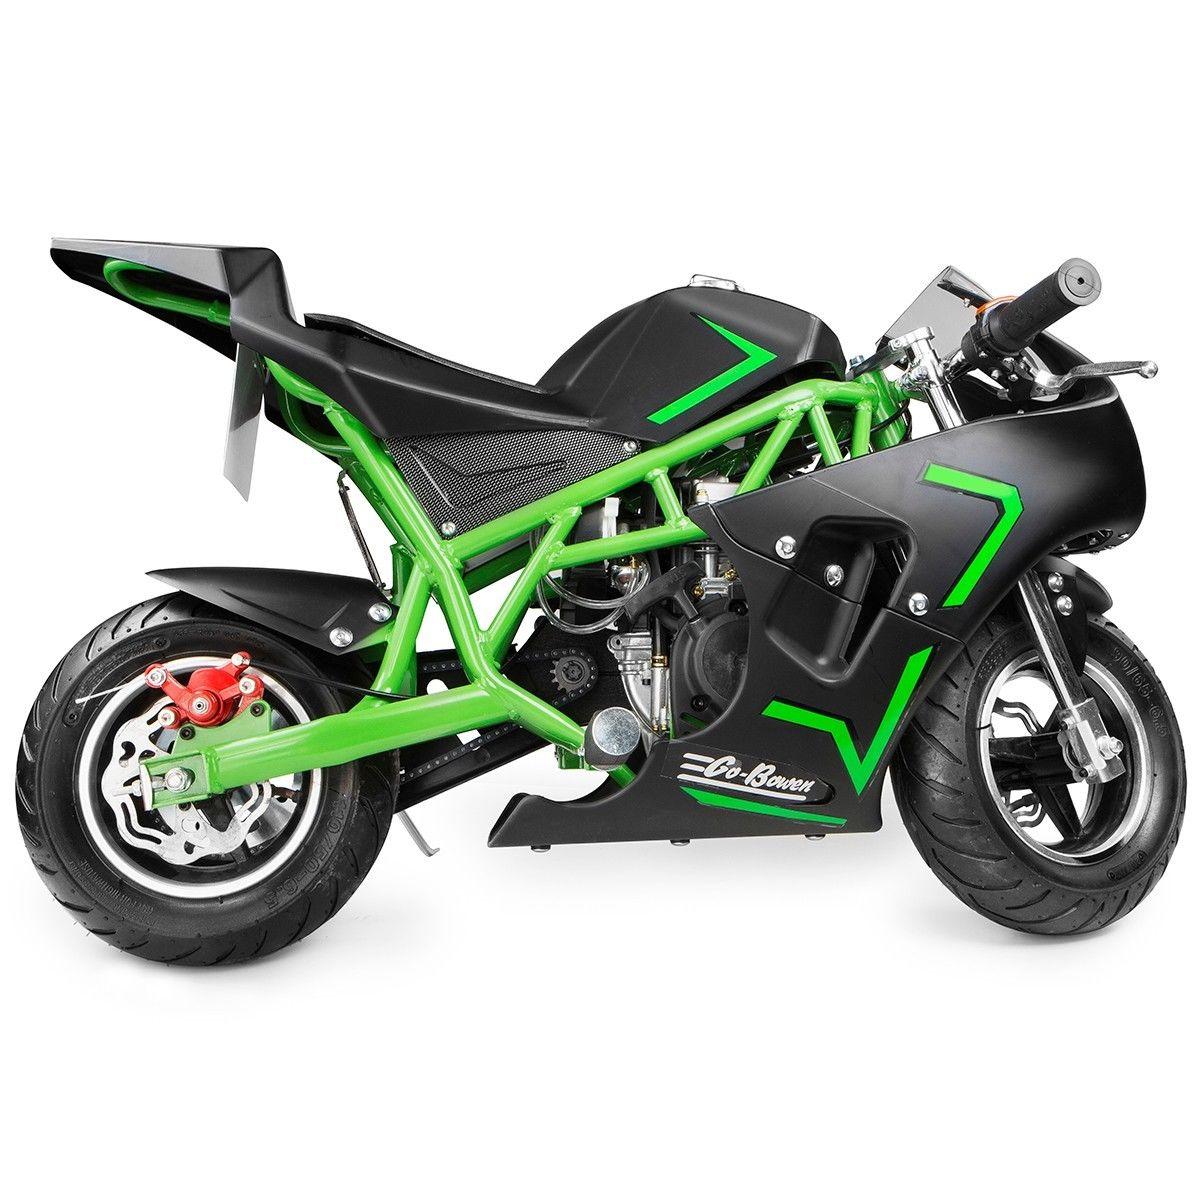 Xtremepowerus Gas Pocket Bike Motor Bike Scooter 40cc Epa Engine Motorcycle Ebay